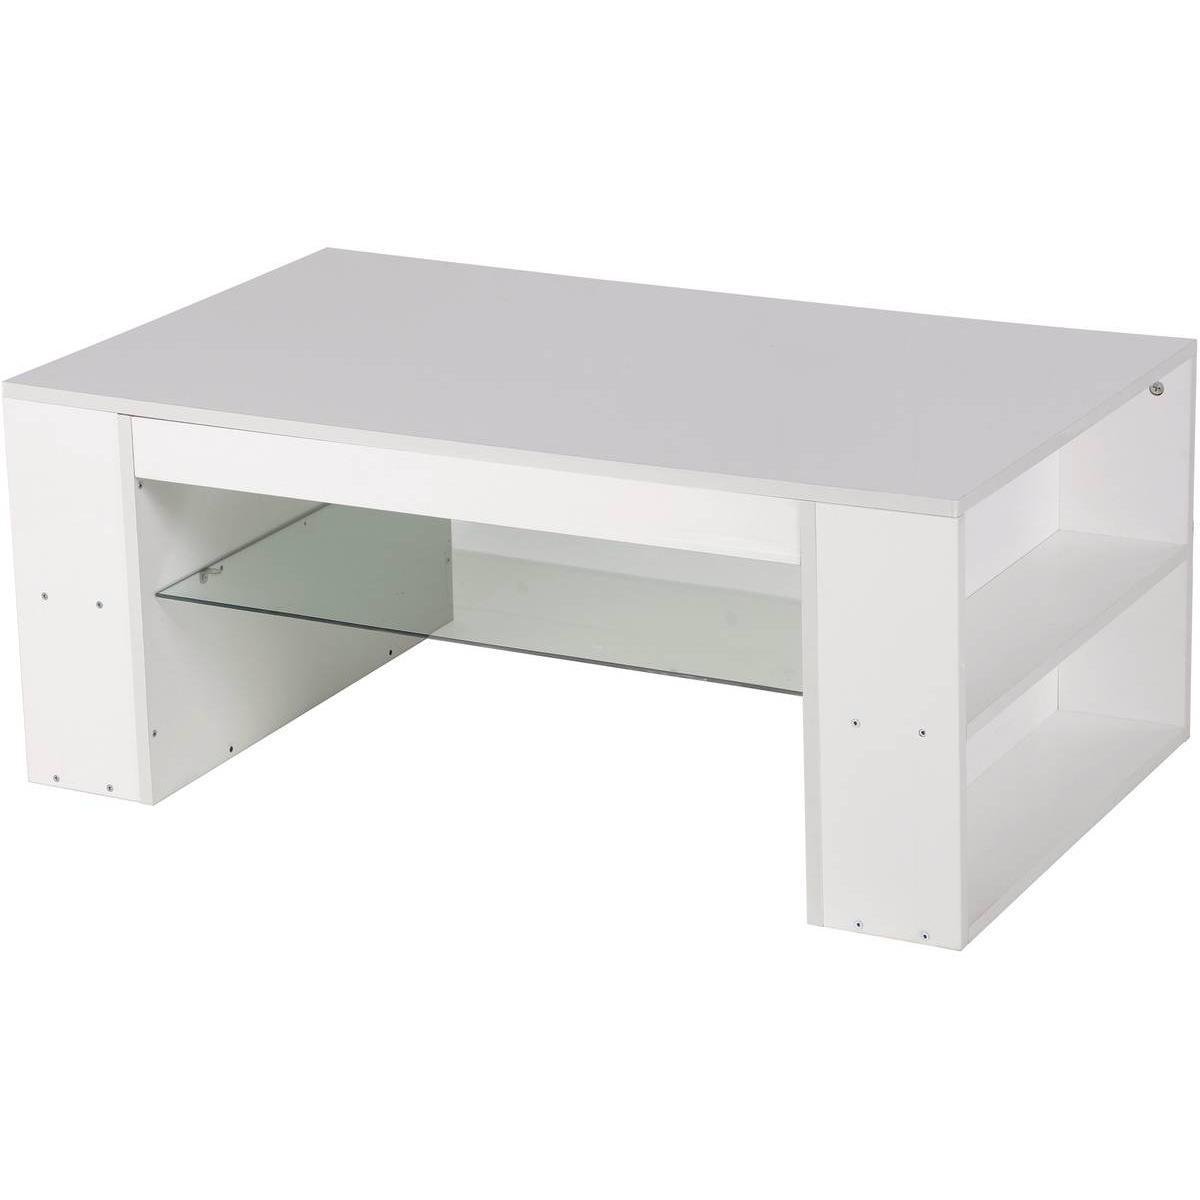 Habitat Et Jardin Table basse Lawson laqué - Blanc